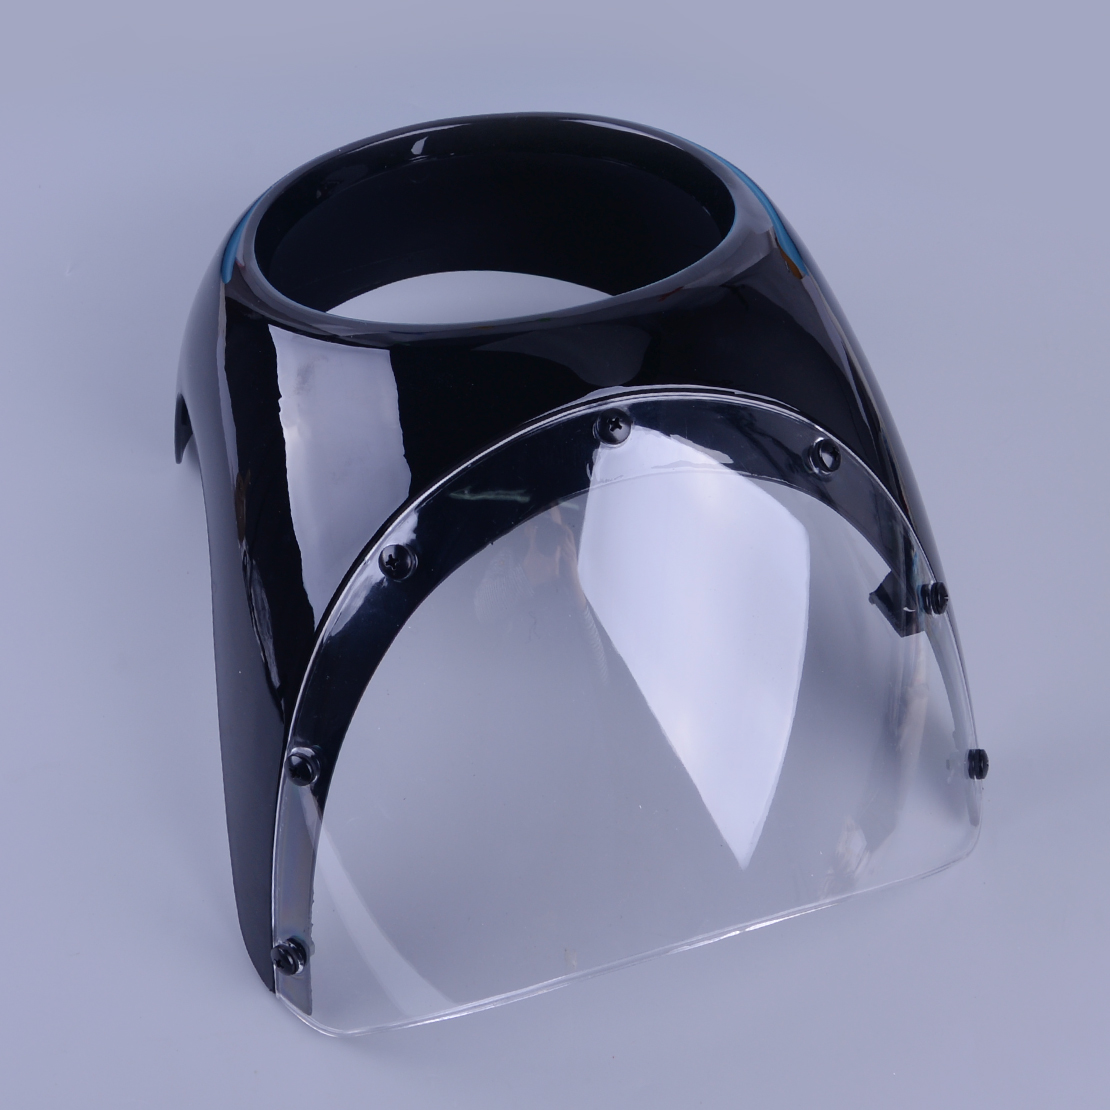 DWCX 17cm Motorcycle Cafe Racer Headlight Fairing Screen Retro Drag Racing Light Fairing Windshield